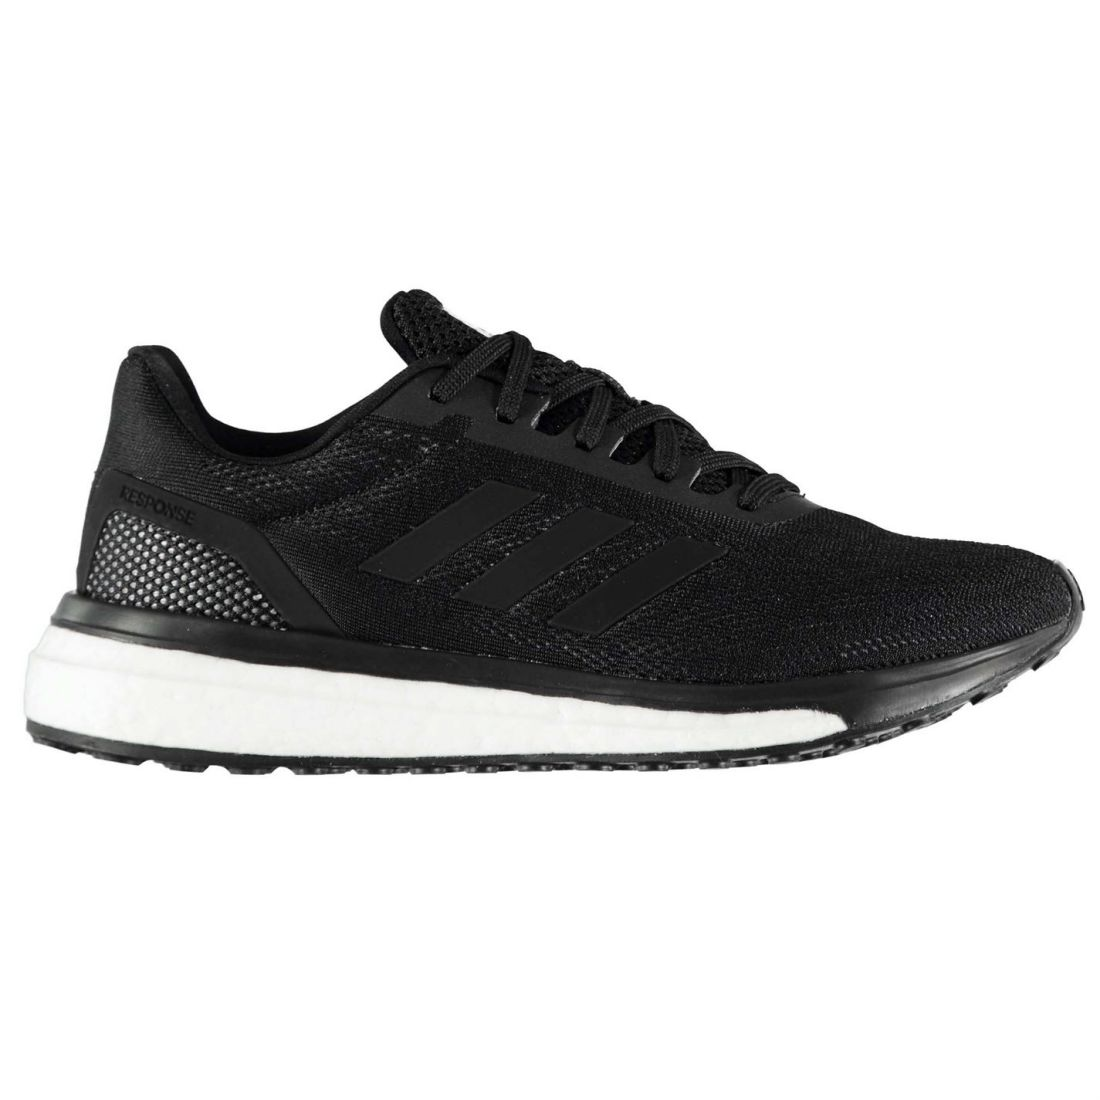 bdf3984dcdd adidas Response Running Shoes Ladies Road Mesh Upper Stretch ...